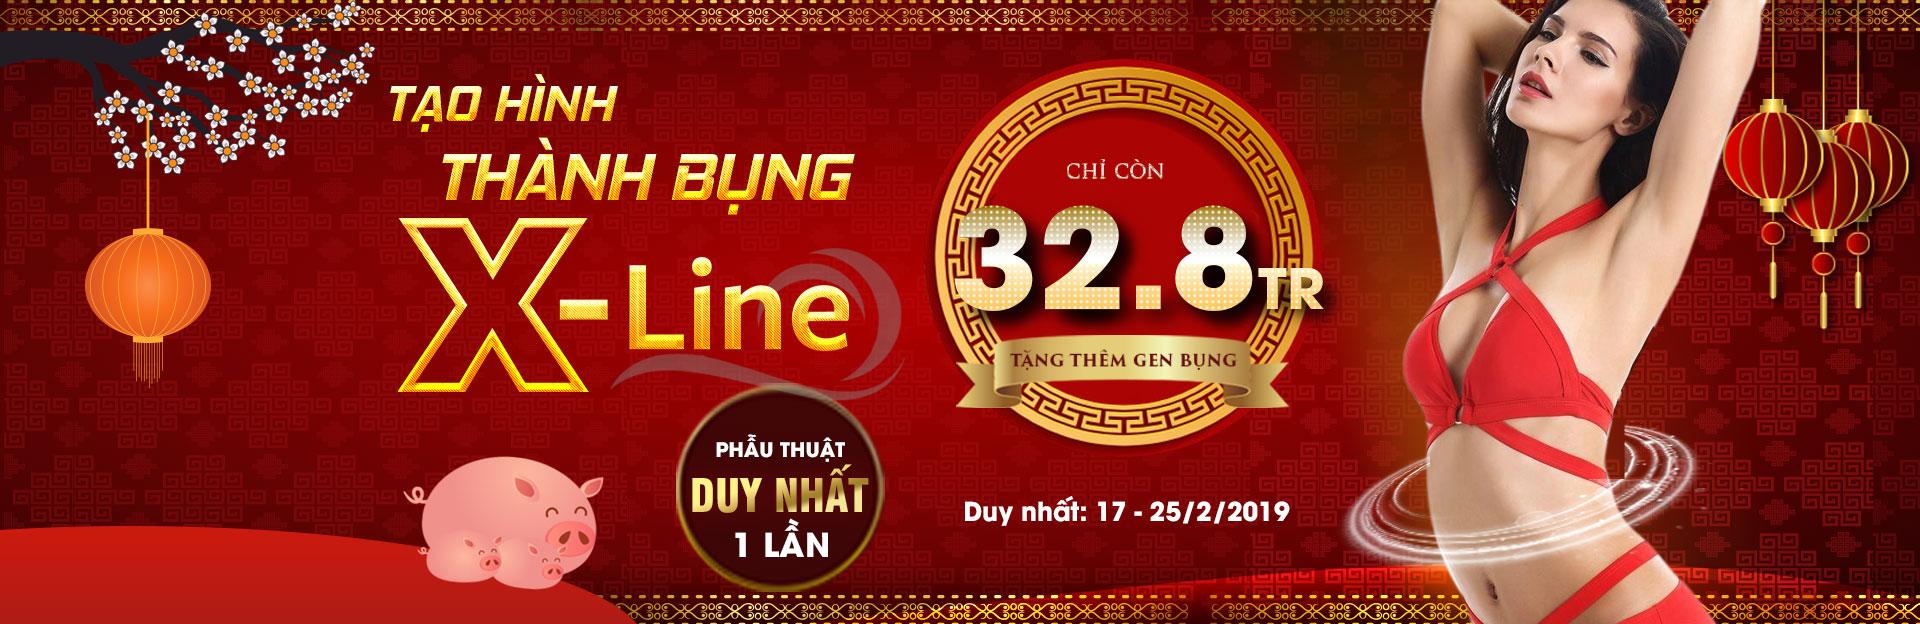 TAO HINH THANH BUNG